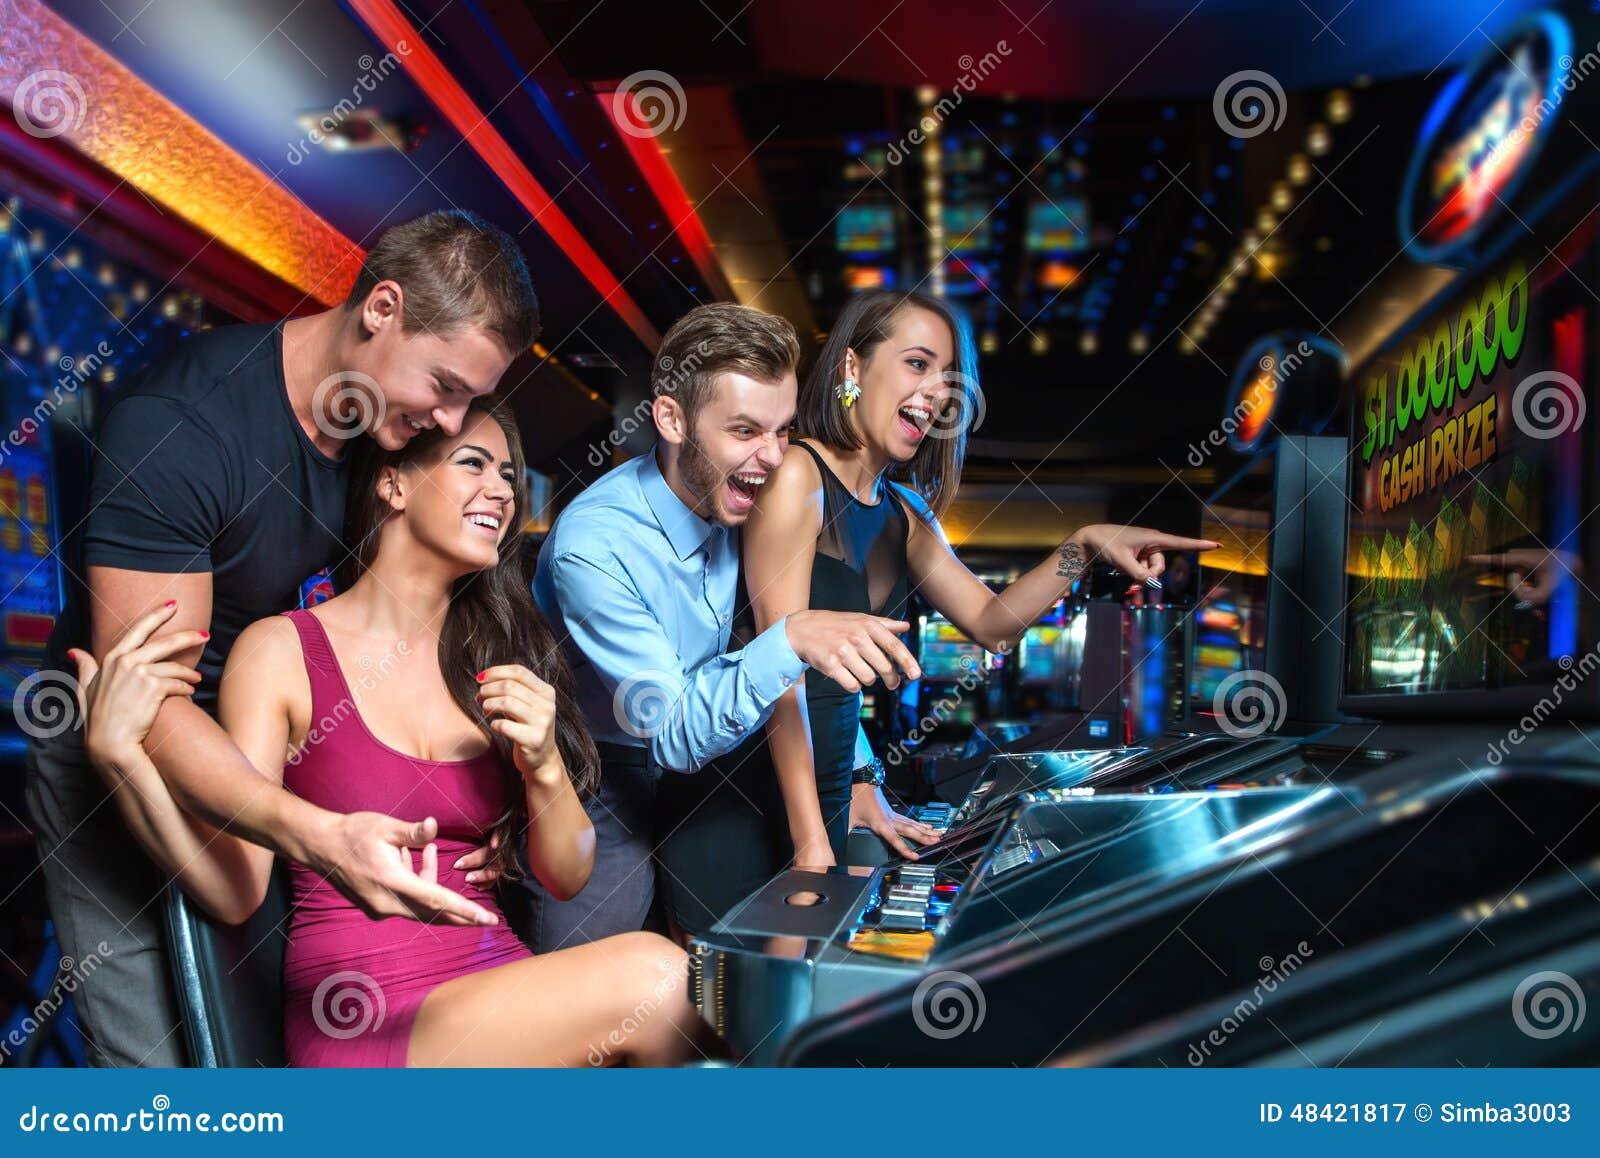 win on slot machine